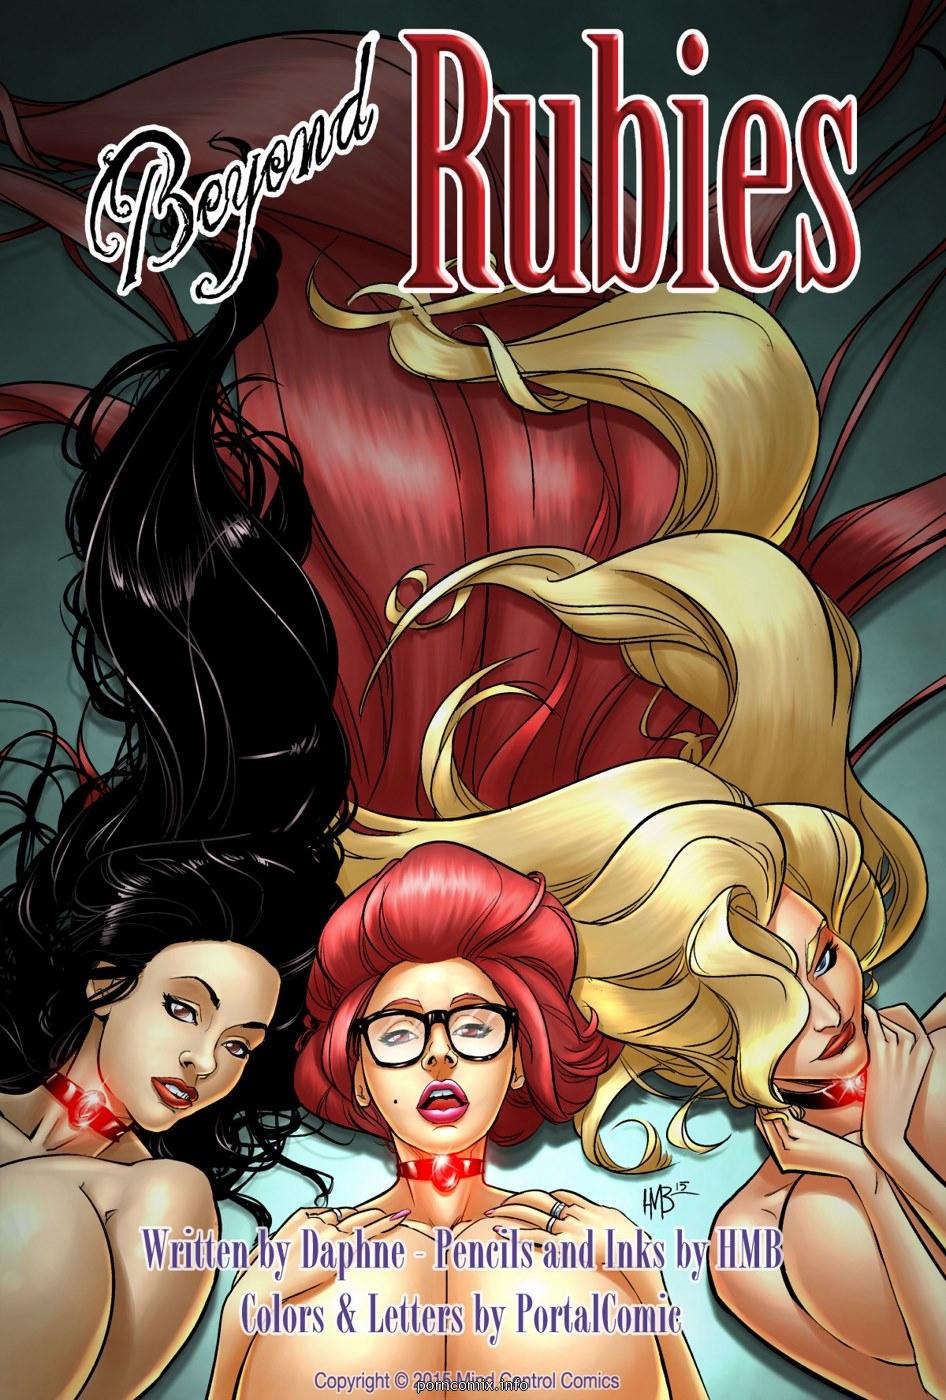 Porn Comics - Beyond Rubies 13- MCC porn comics 8 muses